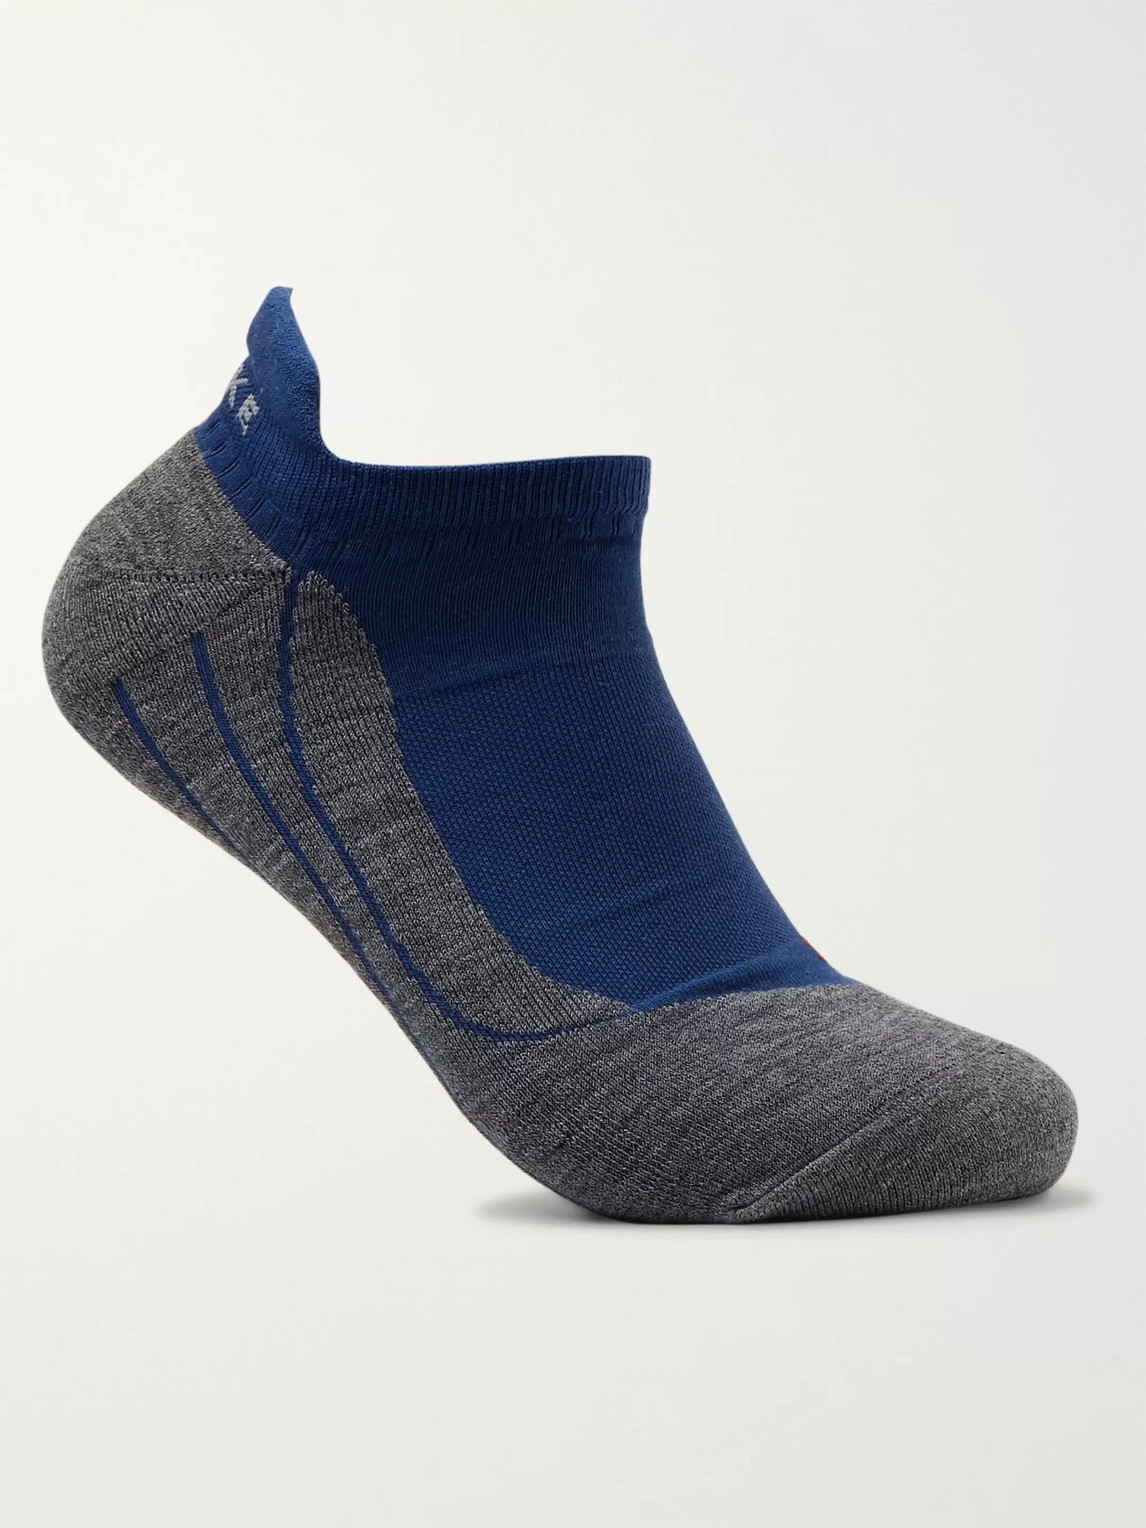 falke ergonomic sport system - ru4 invisible stretch-knit socks - men - blue